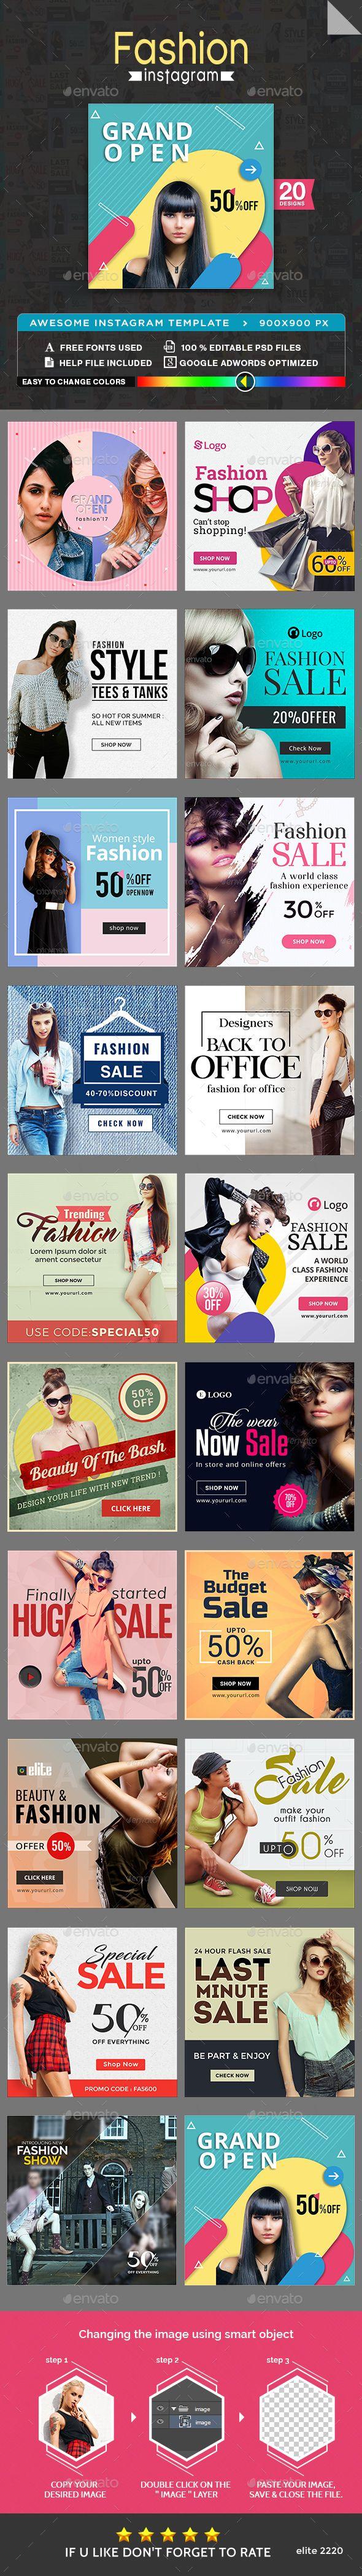 Fashion Sale Instagram Banner Templates PSD  - 20 Designs